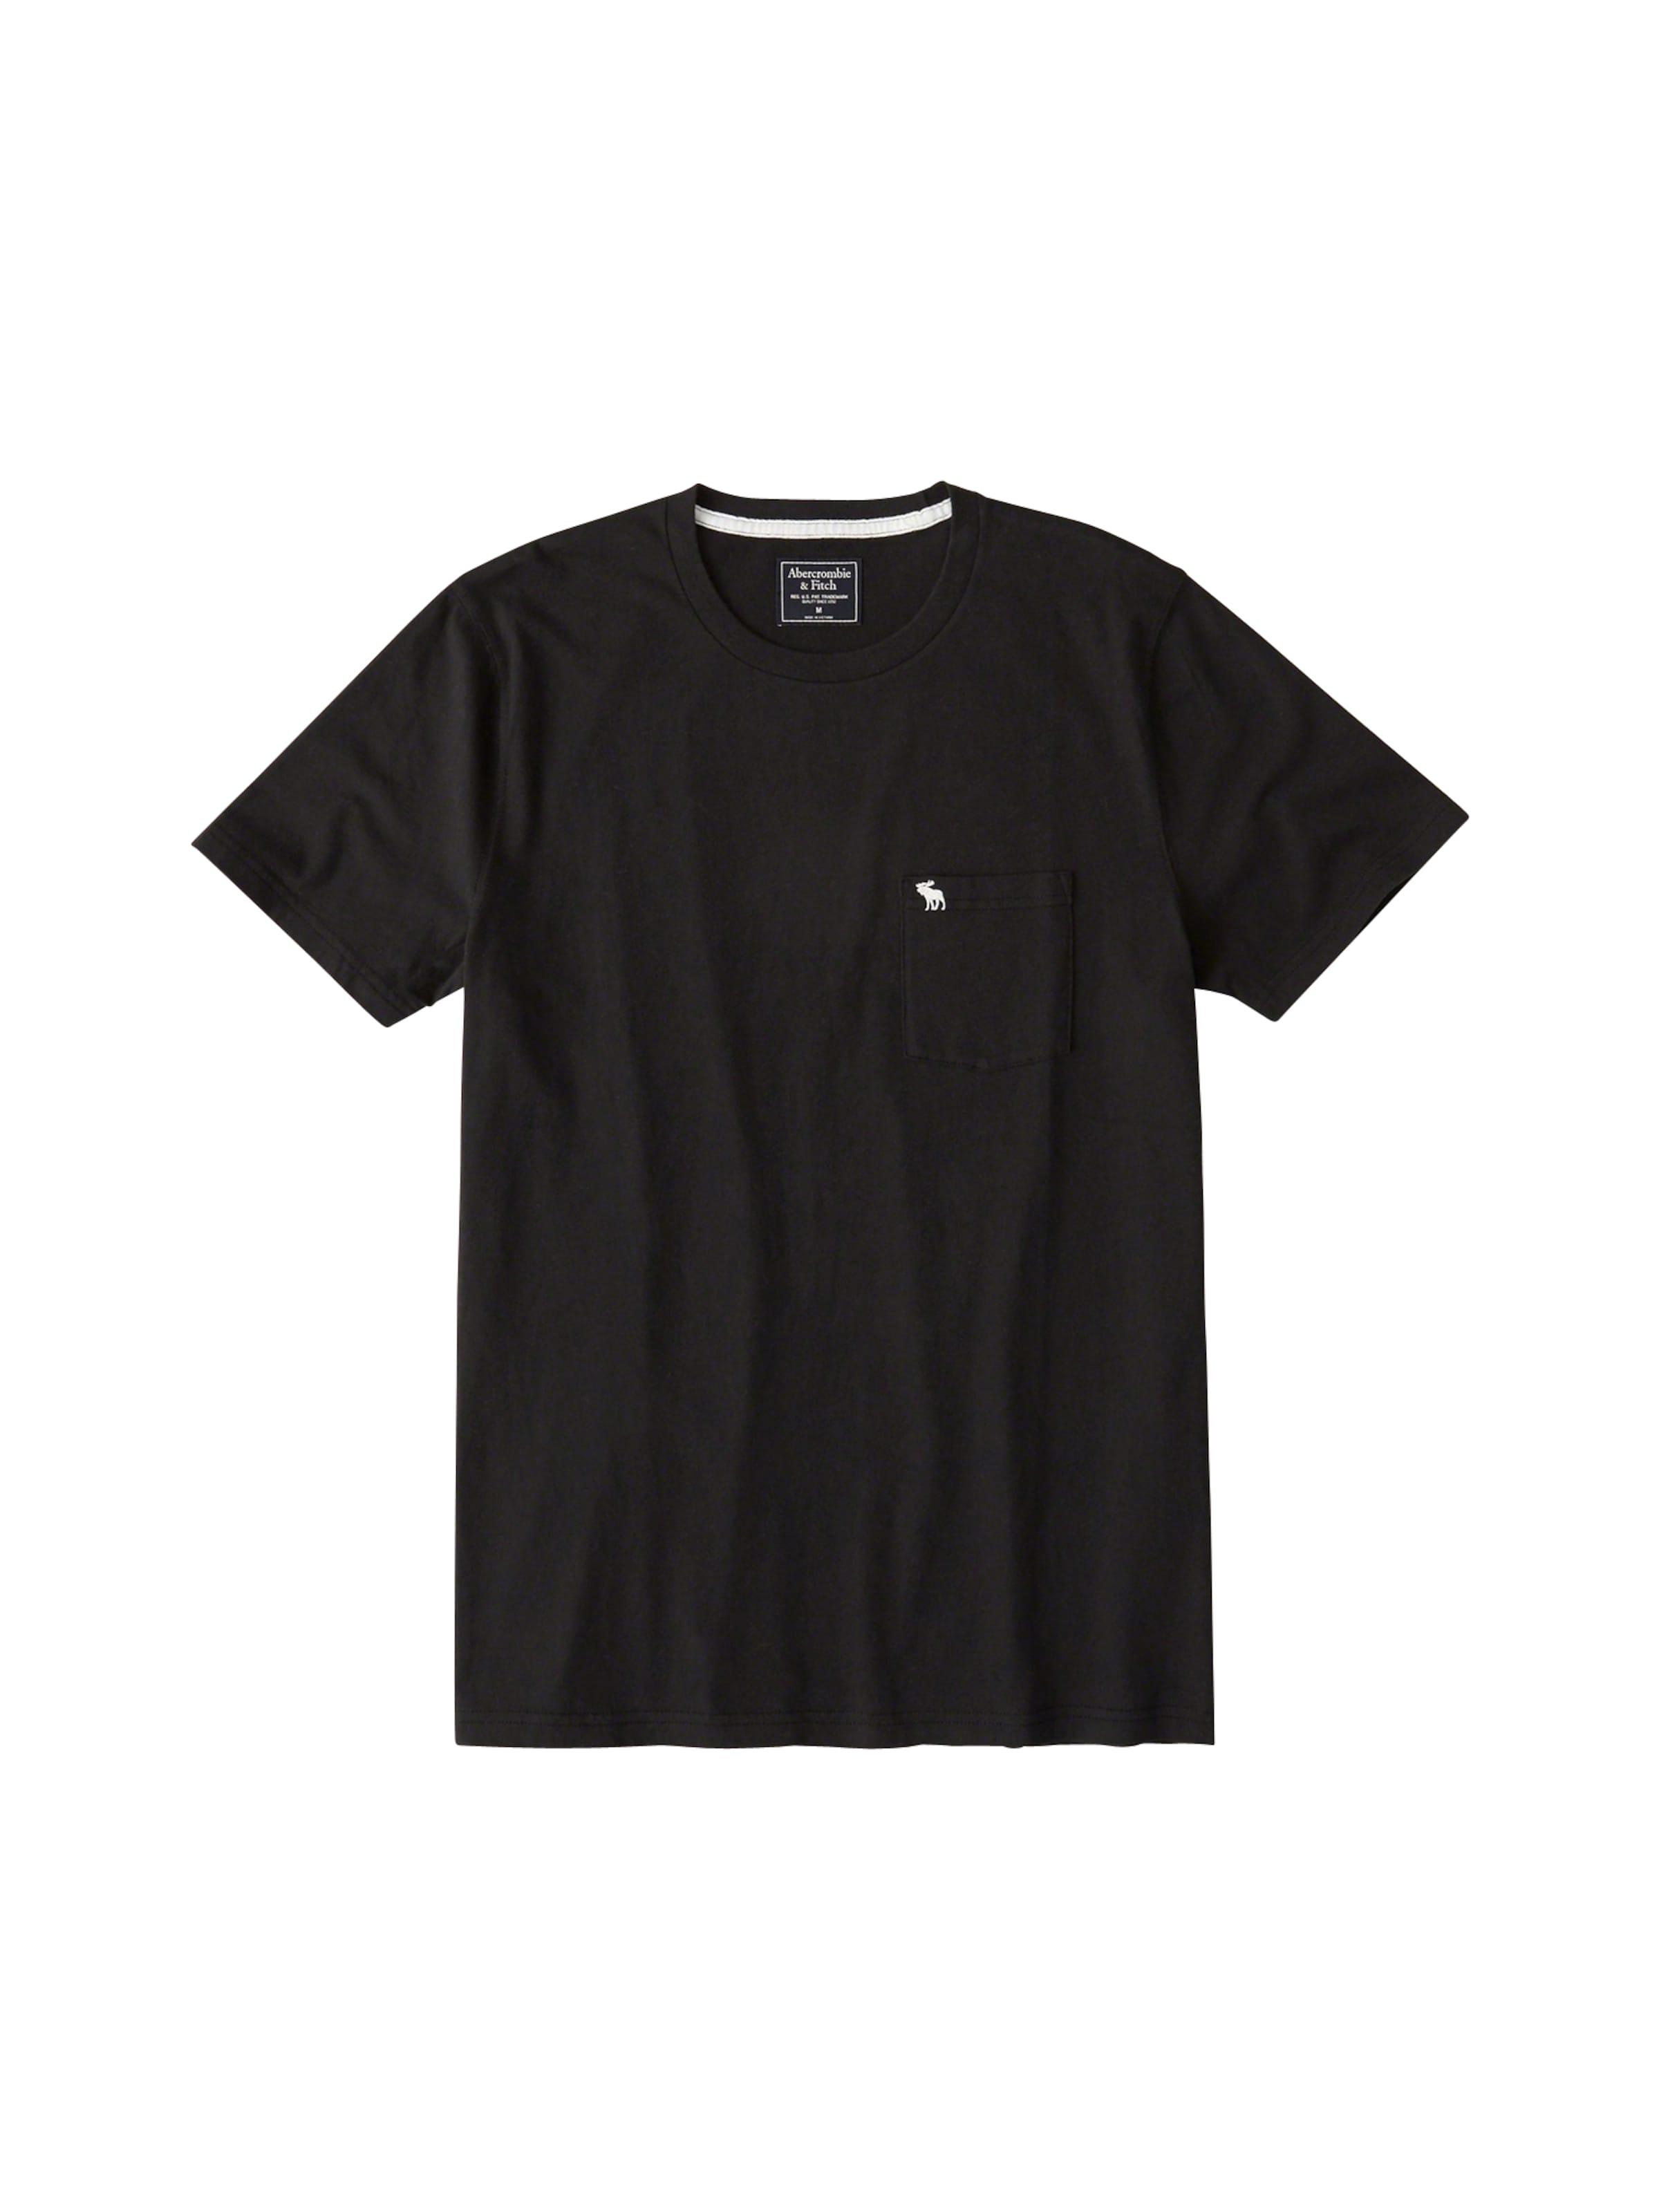 T Abercrombieamp; En Fitch shirt Noir 'crew Neutral' IfY7gb6vym